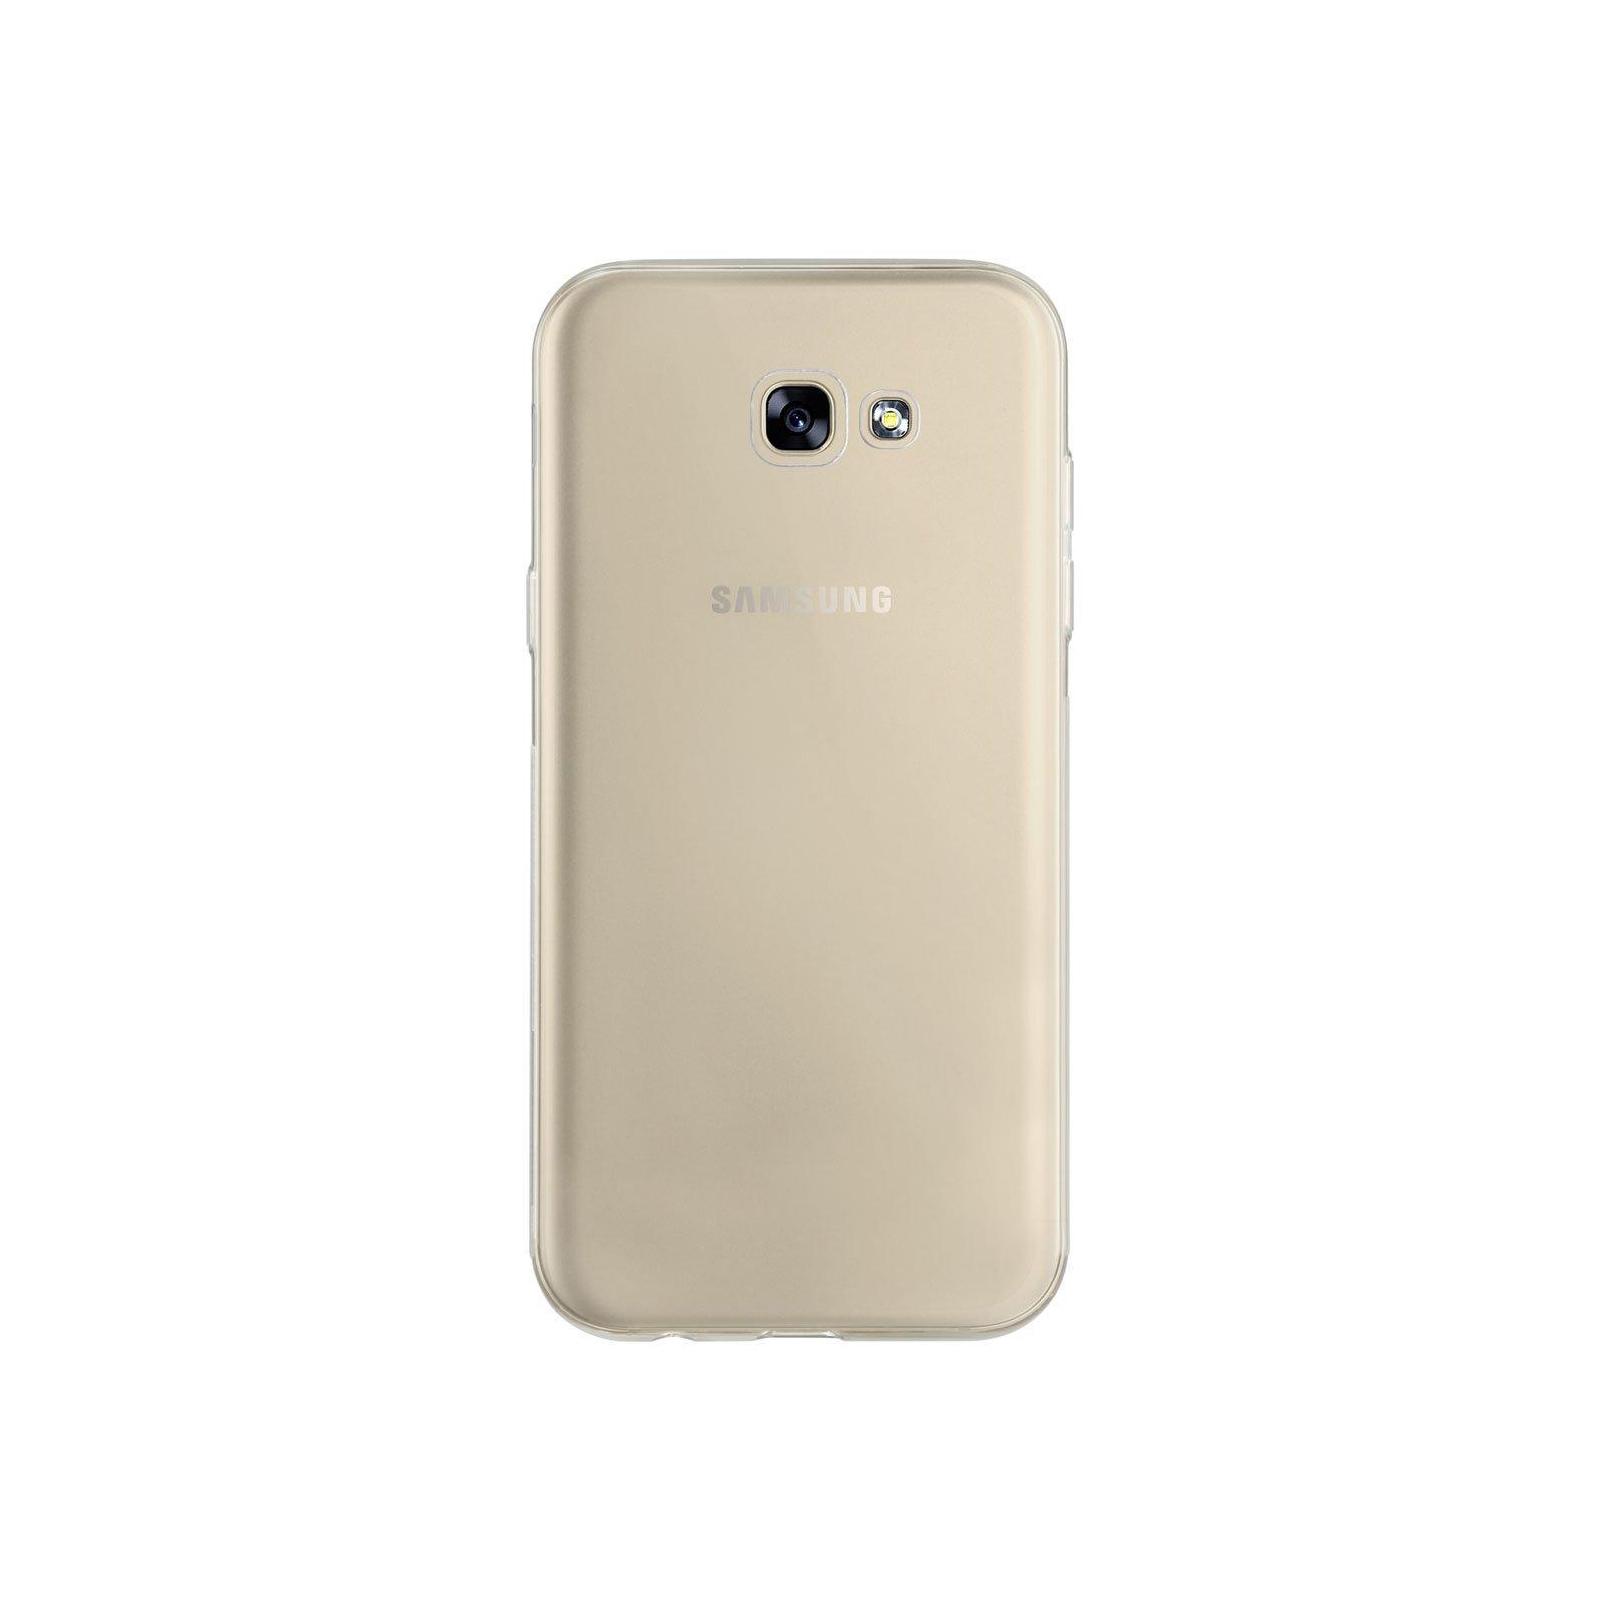 Чехол для моб. телефона SmartCase Samsung Galaxy A5 /A520 TPU Clear (SC-A5) изображение 3